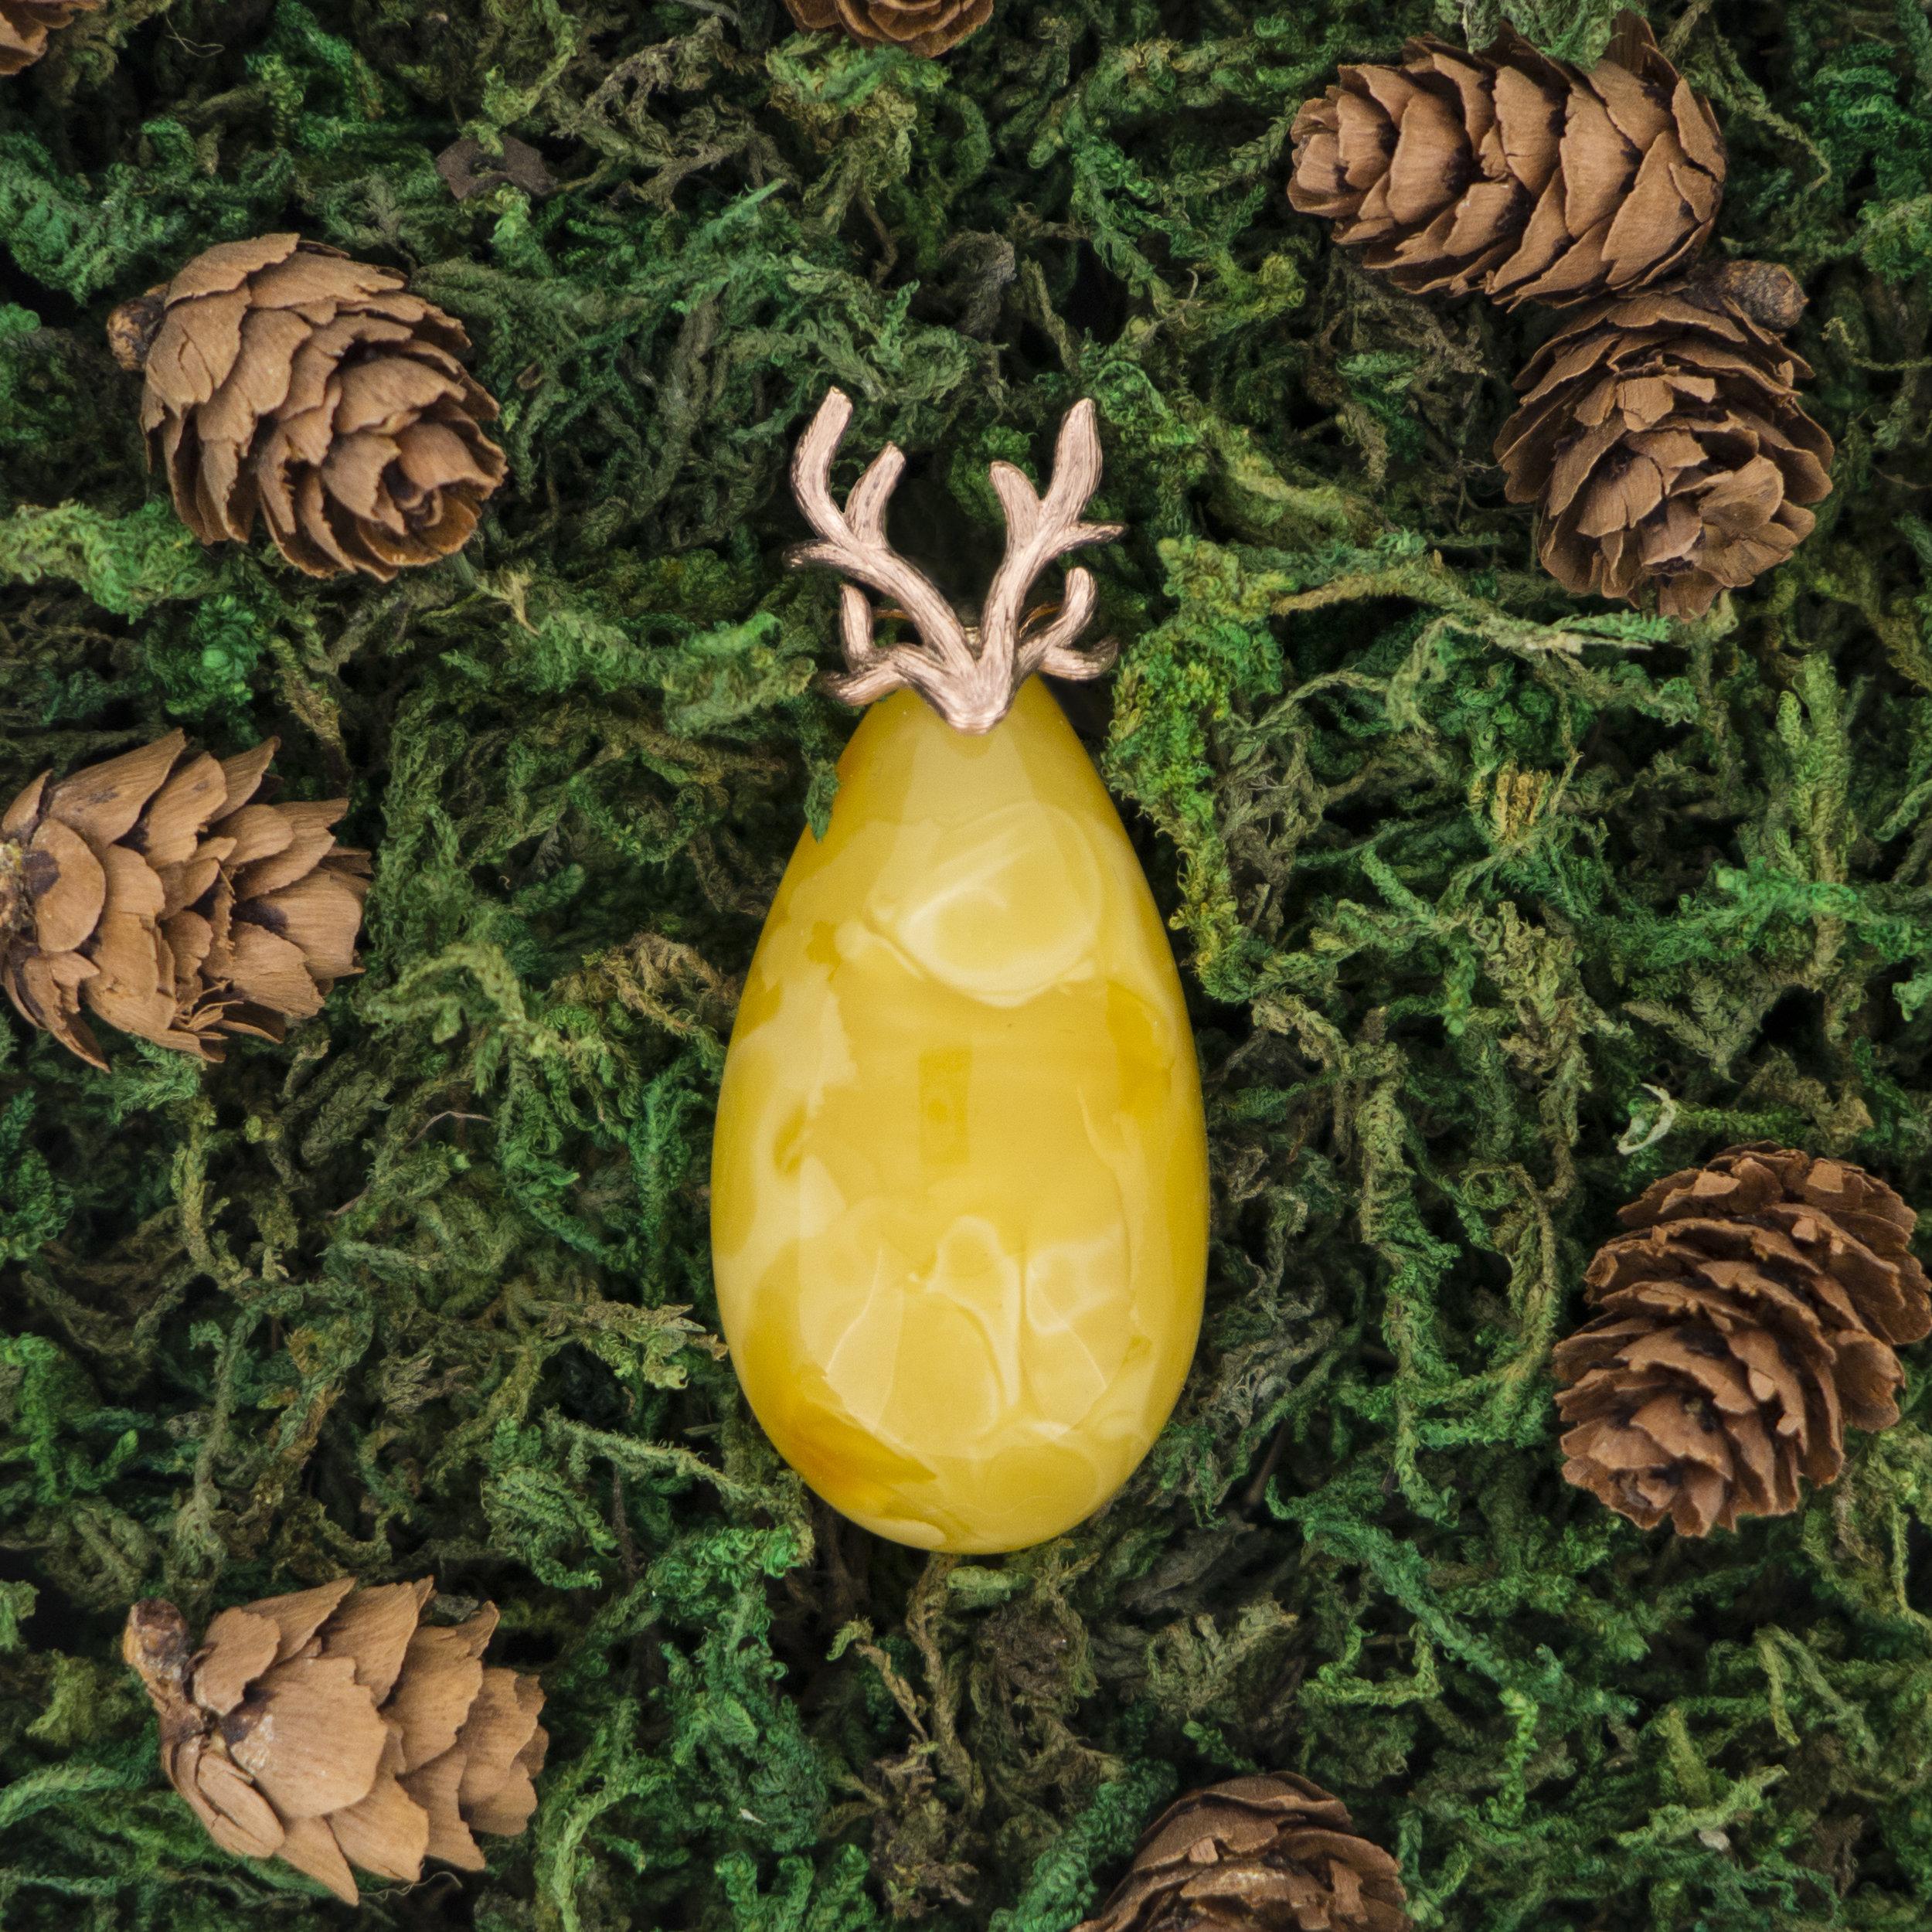 "Fred Green   The following is placeholder text known as ""lorem ipsum,"" which is scrambled Latin used by designers to mimic real copy. Donec eget risus diam. Nulla lectus ante, consequat et ex eget, feugiat tincidunt metus. Lorem ipsum dolor sit amet, consectetur adipiscing elit. Sed a ligula quis sapien lacinia egestas."